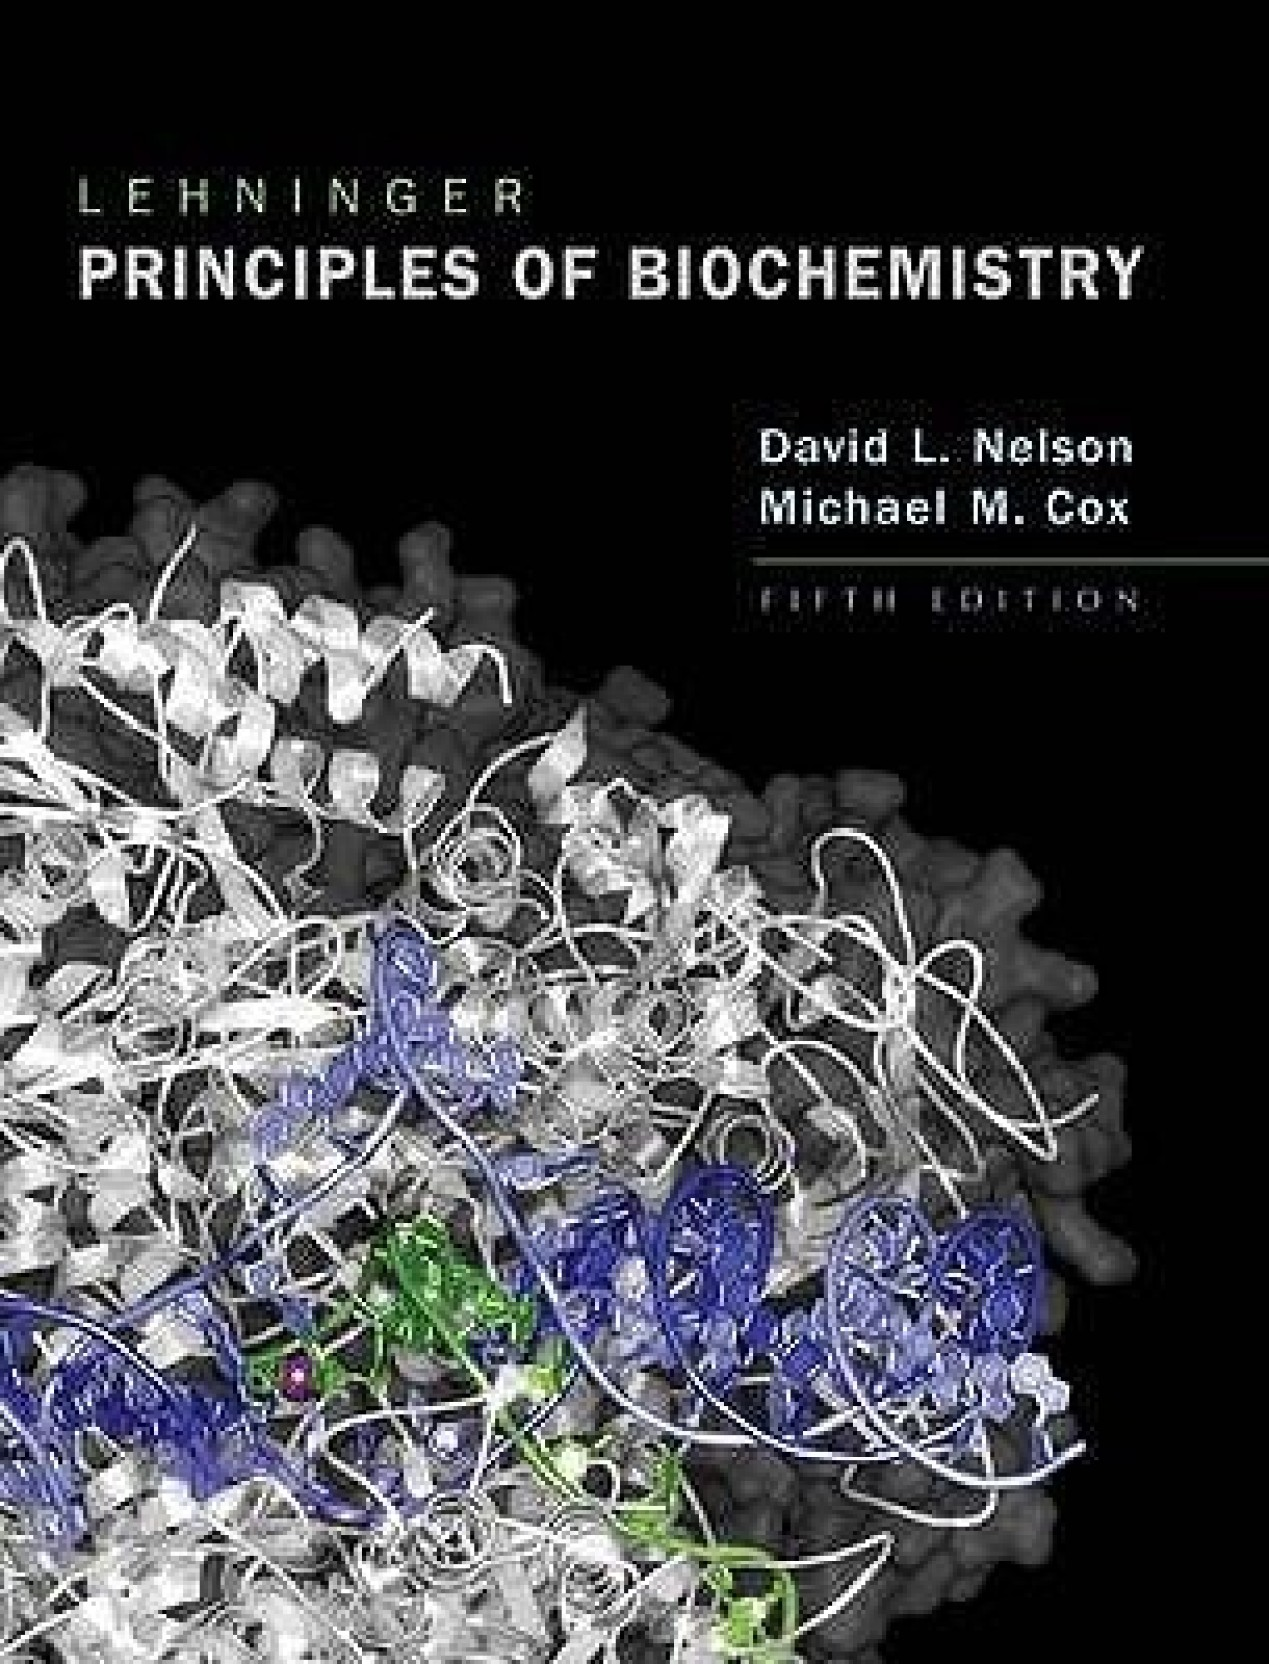 Lehninger Principles of Biochemistry 5th Edition. Share